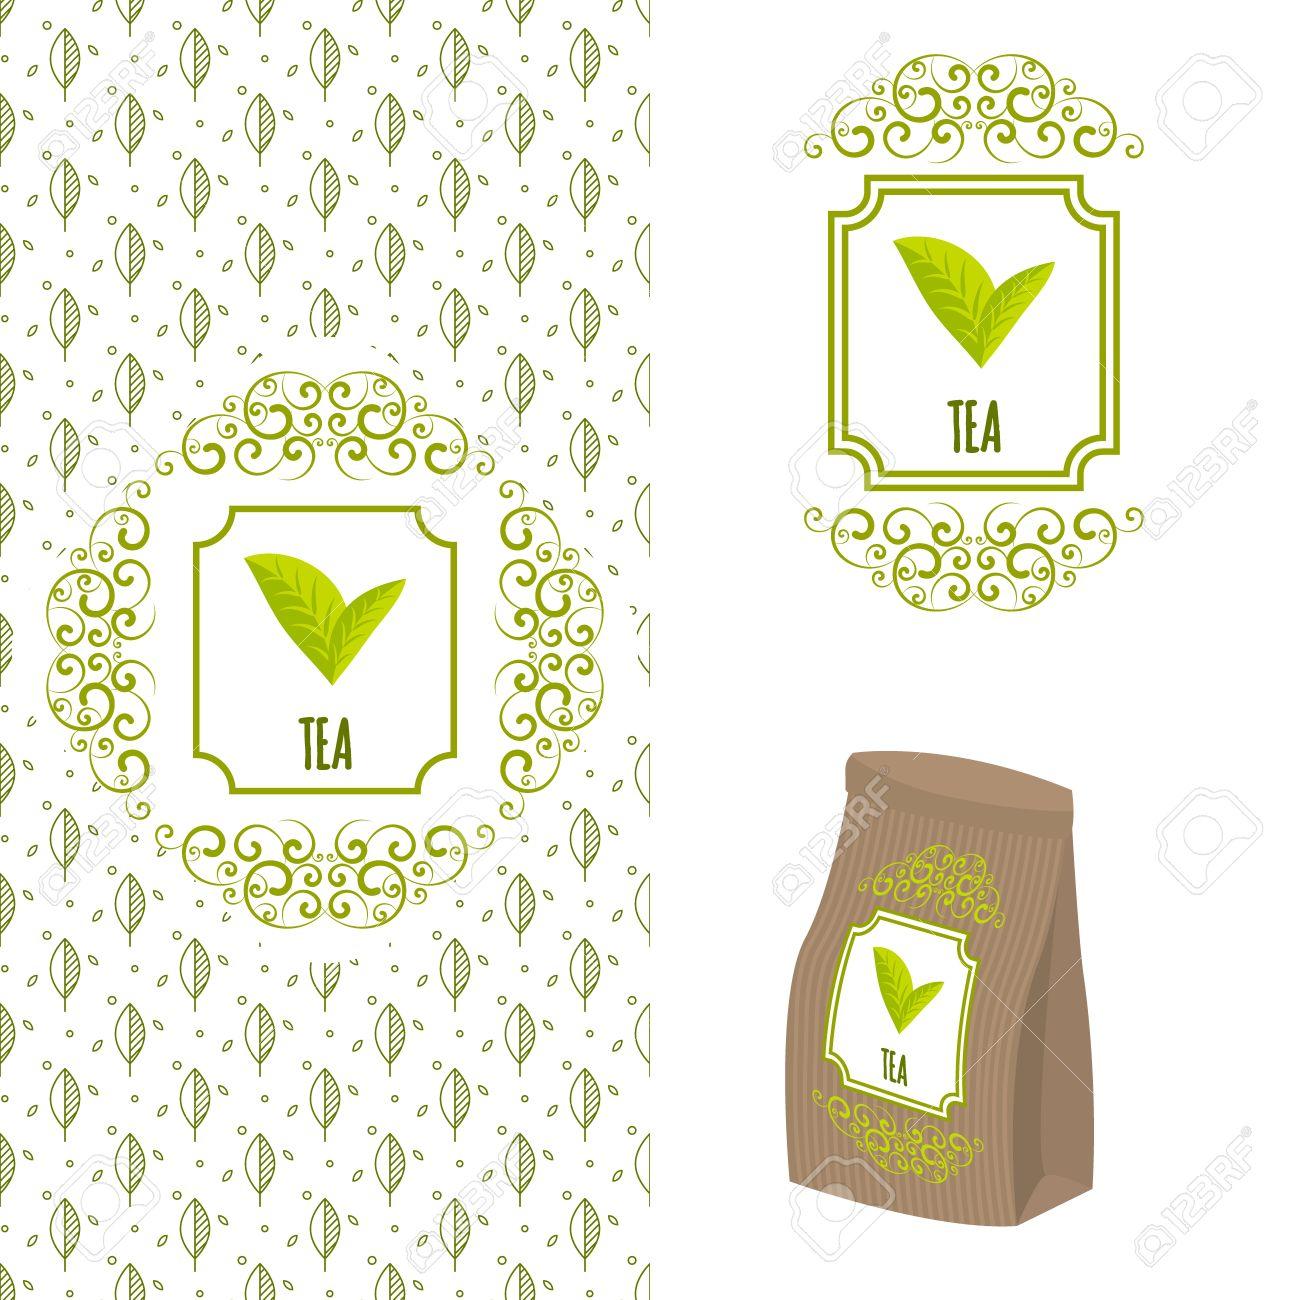 Coffee organic tea - Green Tea Branding Concept Packaging Ornate Template For Organic Tea And Green Coffee Eco